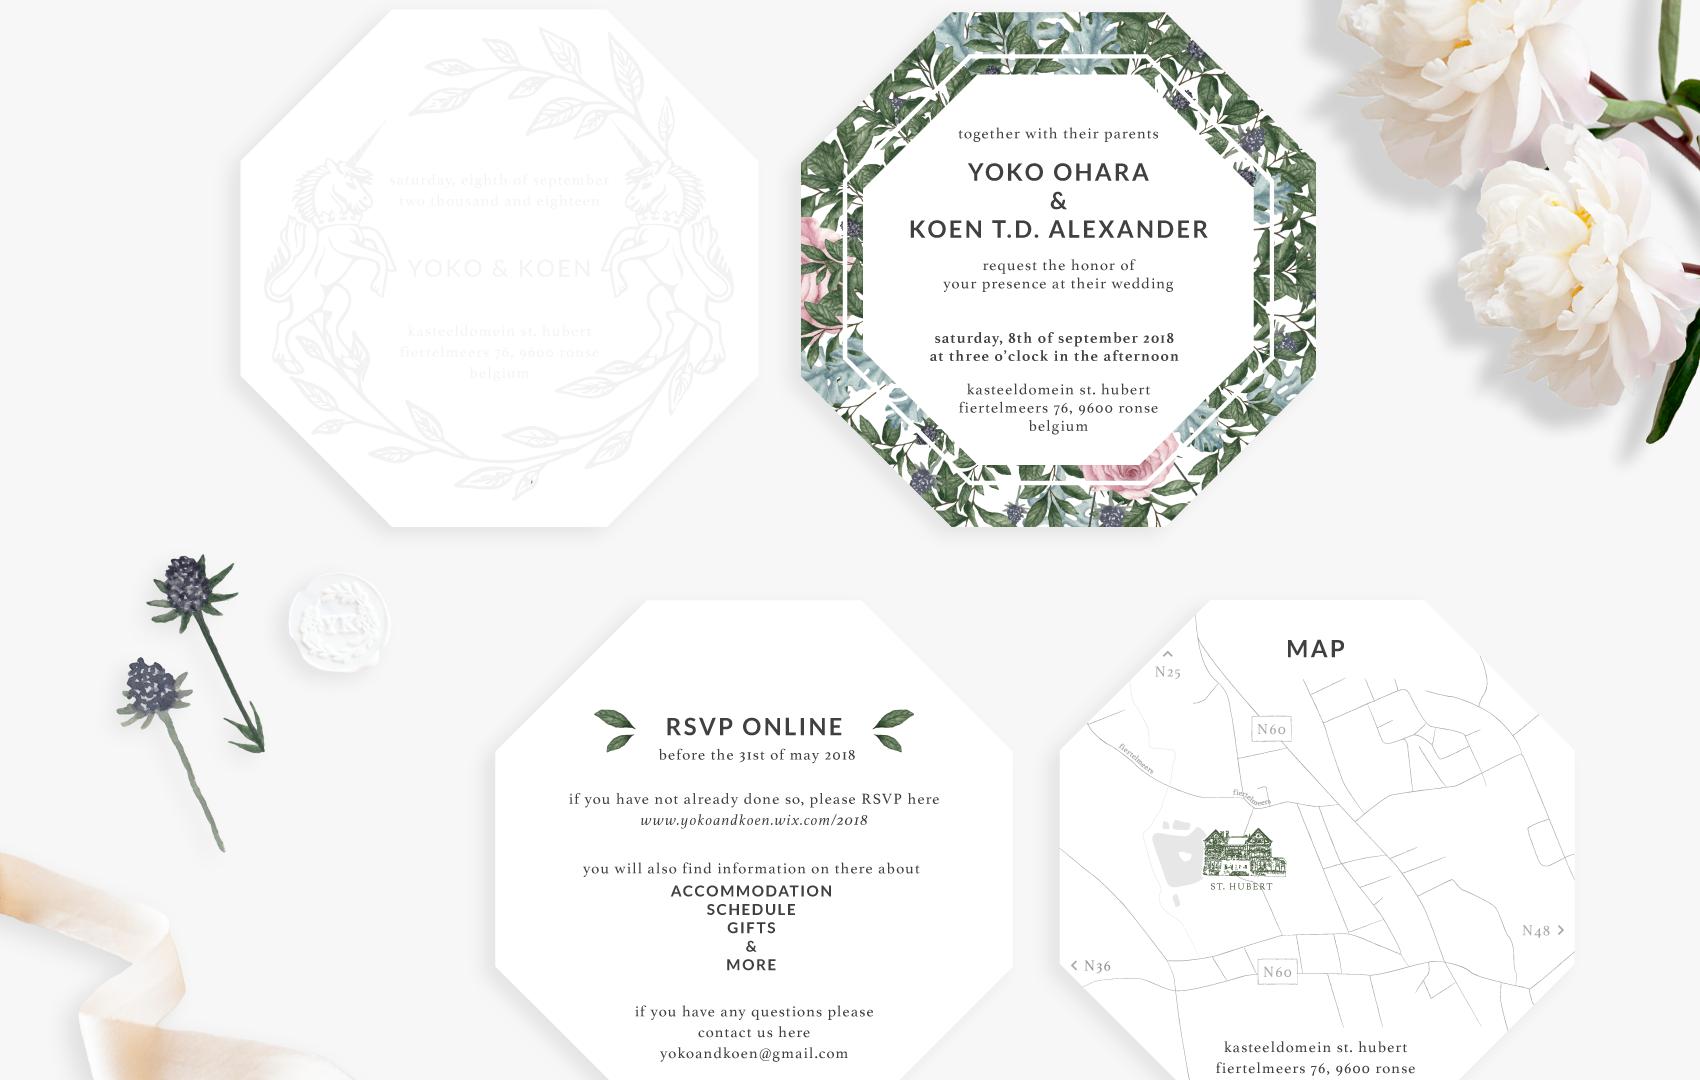 Invitation: Letter press card, Invitation, RSVP, Map, Wax seal